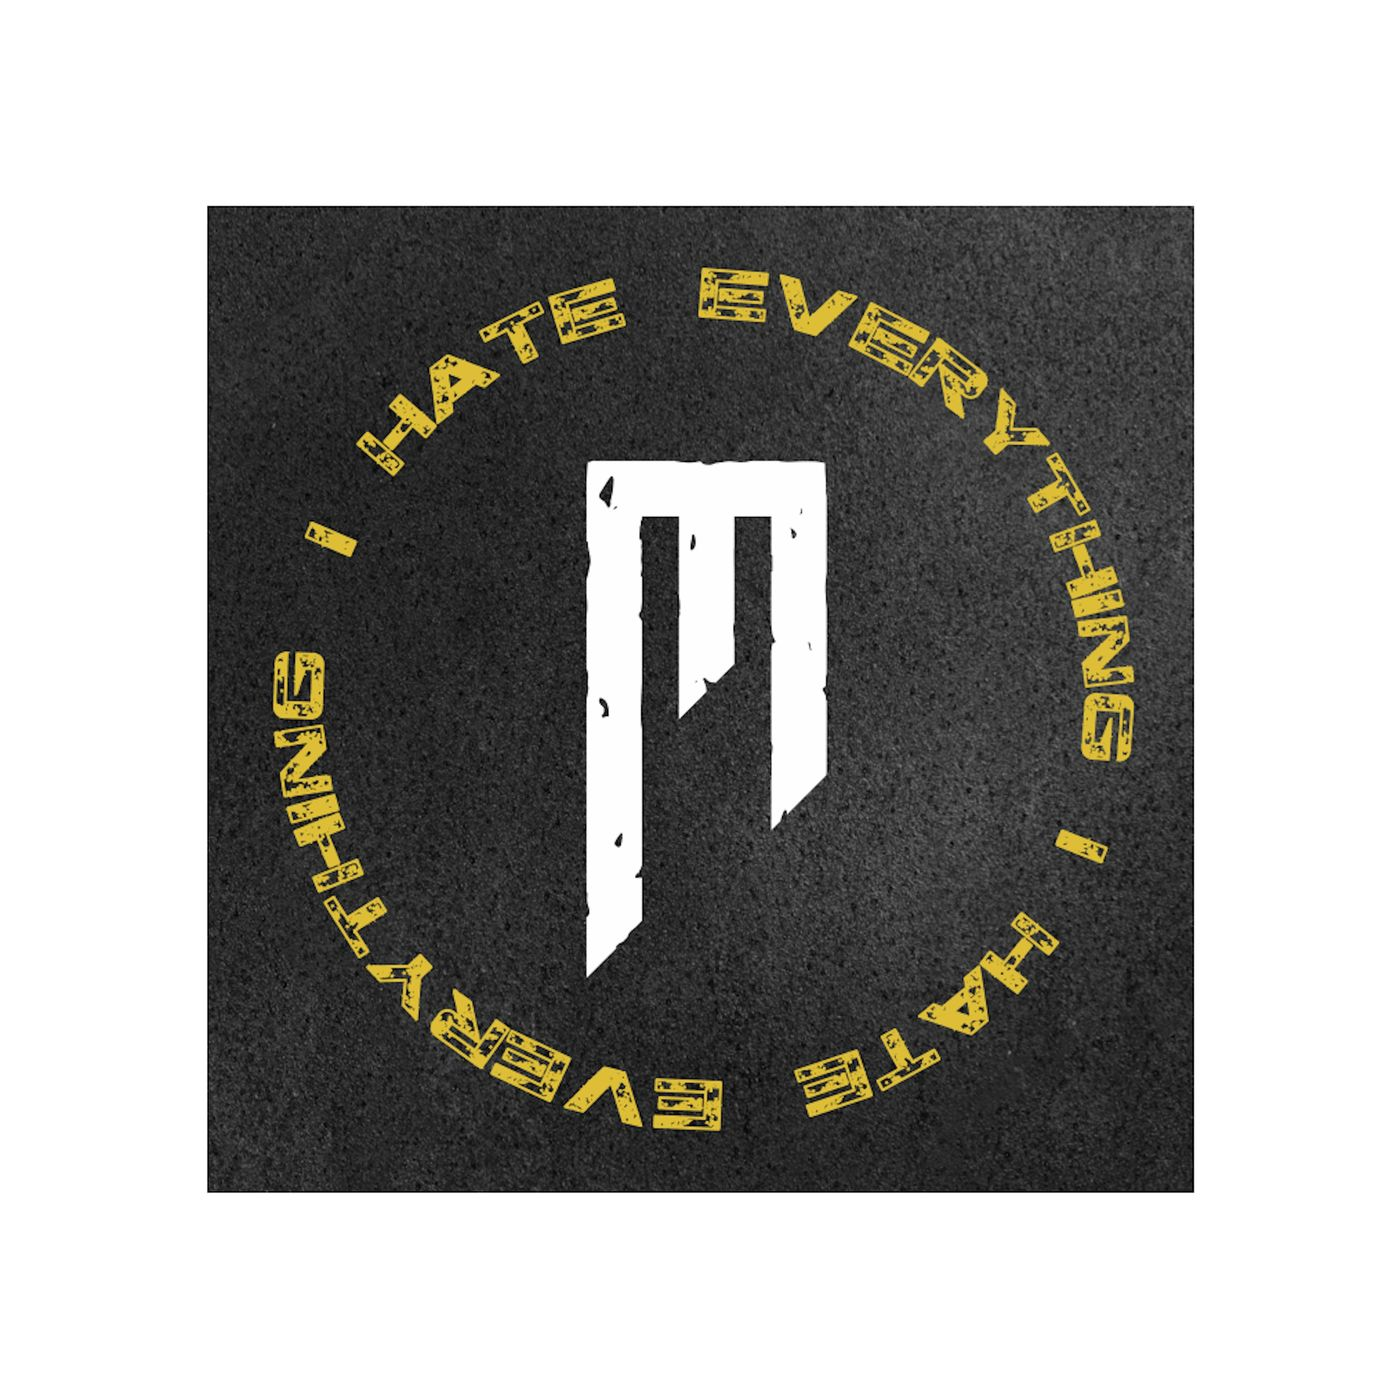 Make My Day - I HATE EVERYTHING [single] (2019)